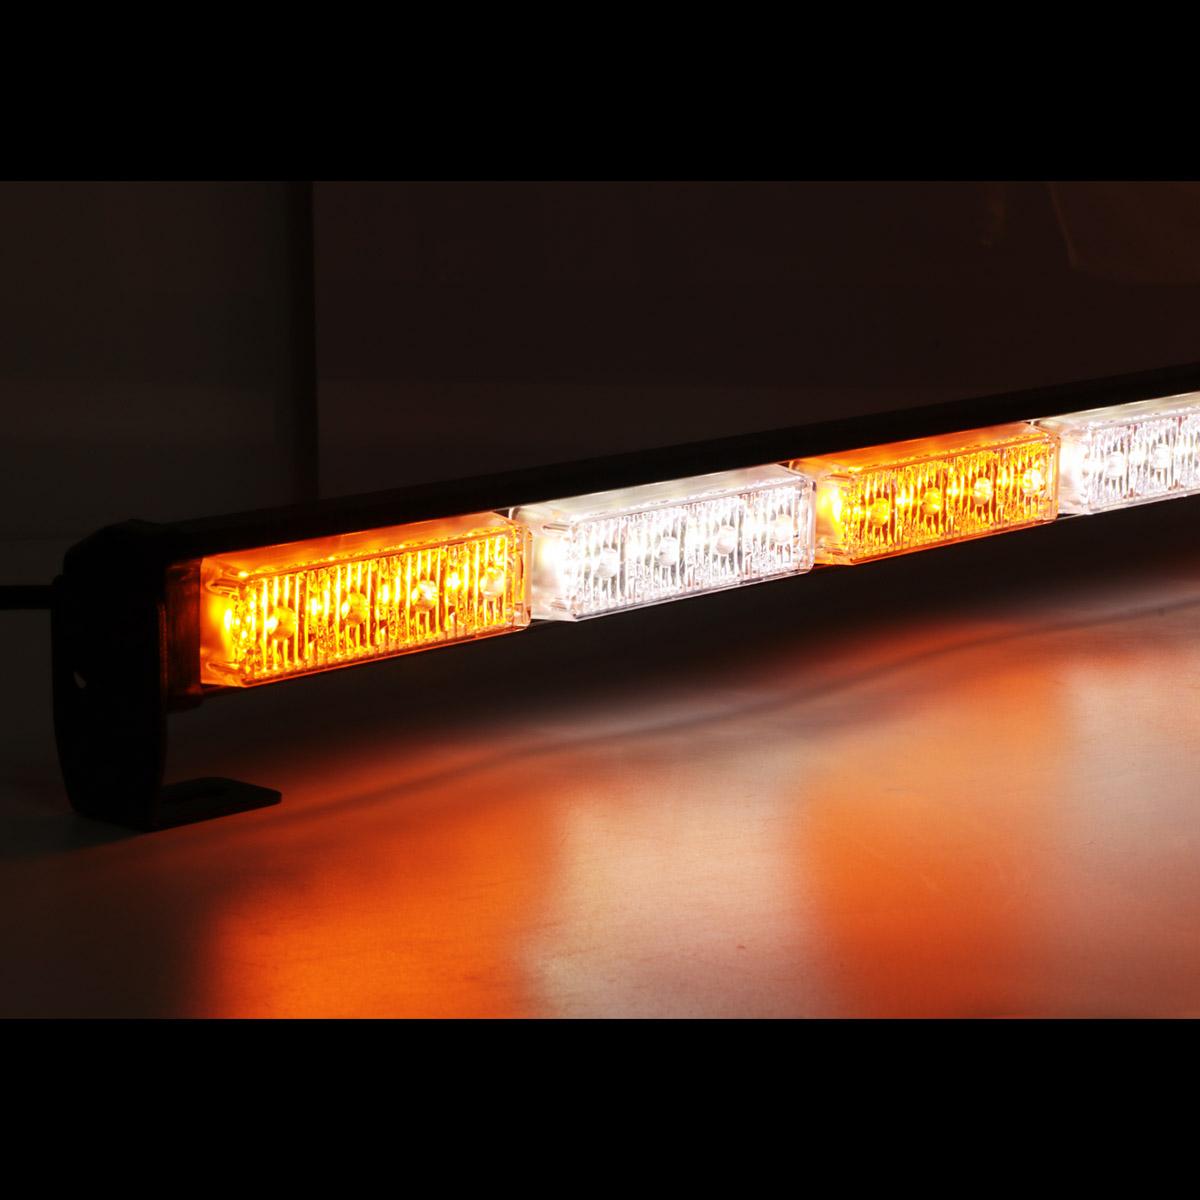 31 28 led emergency warning traffic advisor flash strobe. Black Bedroom Furniture Sets. Home Design Ideas